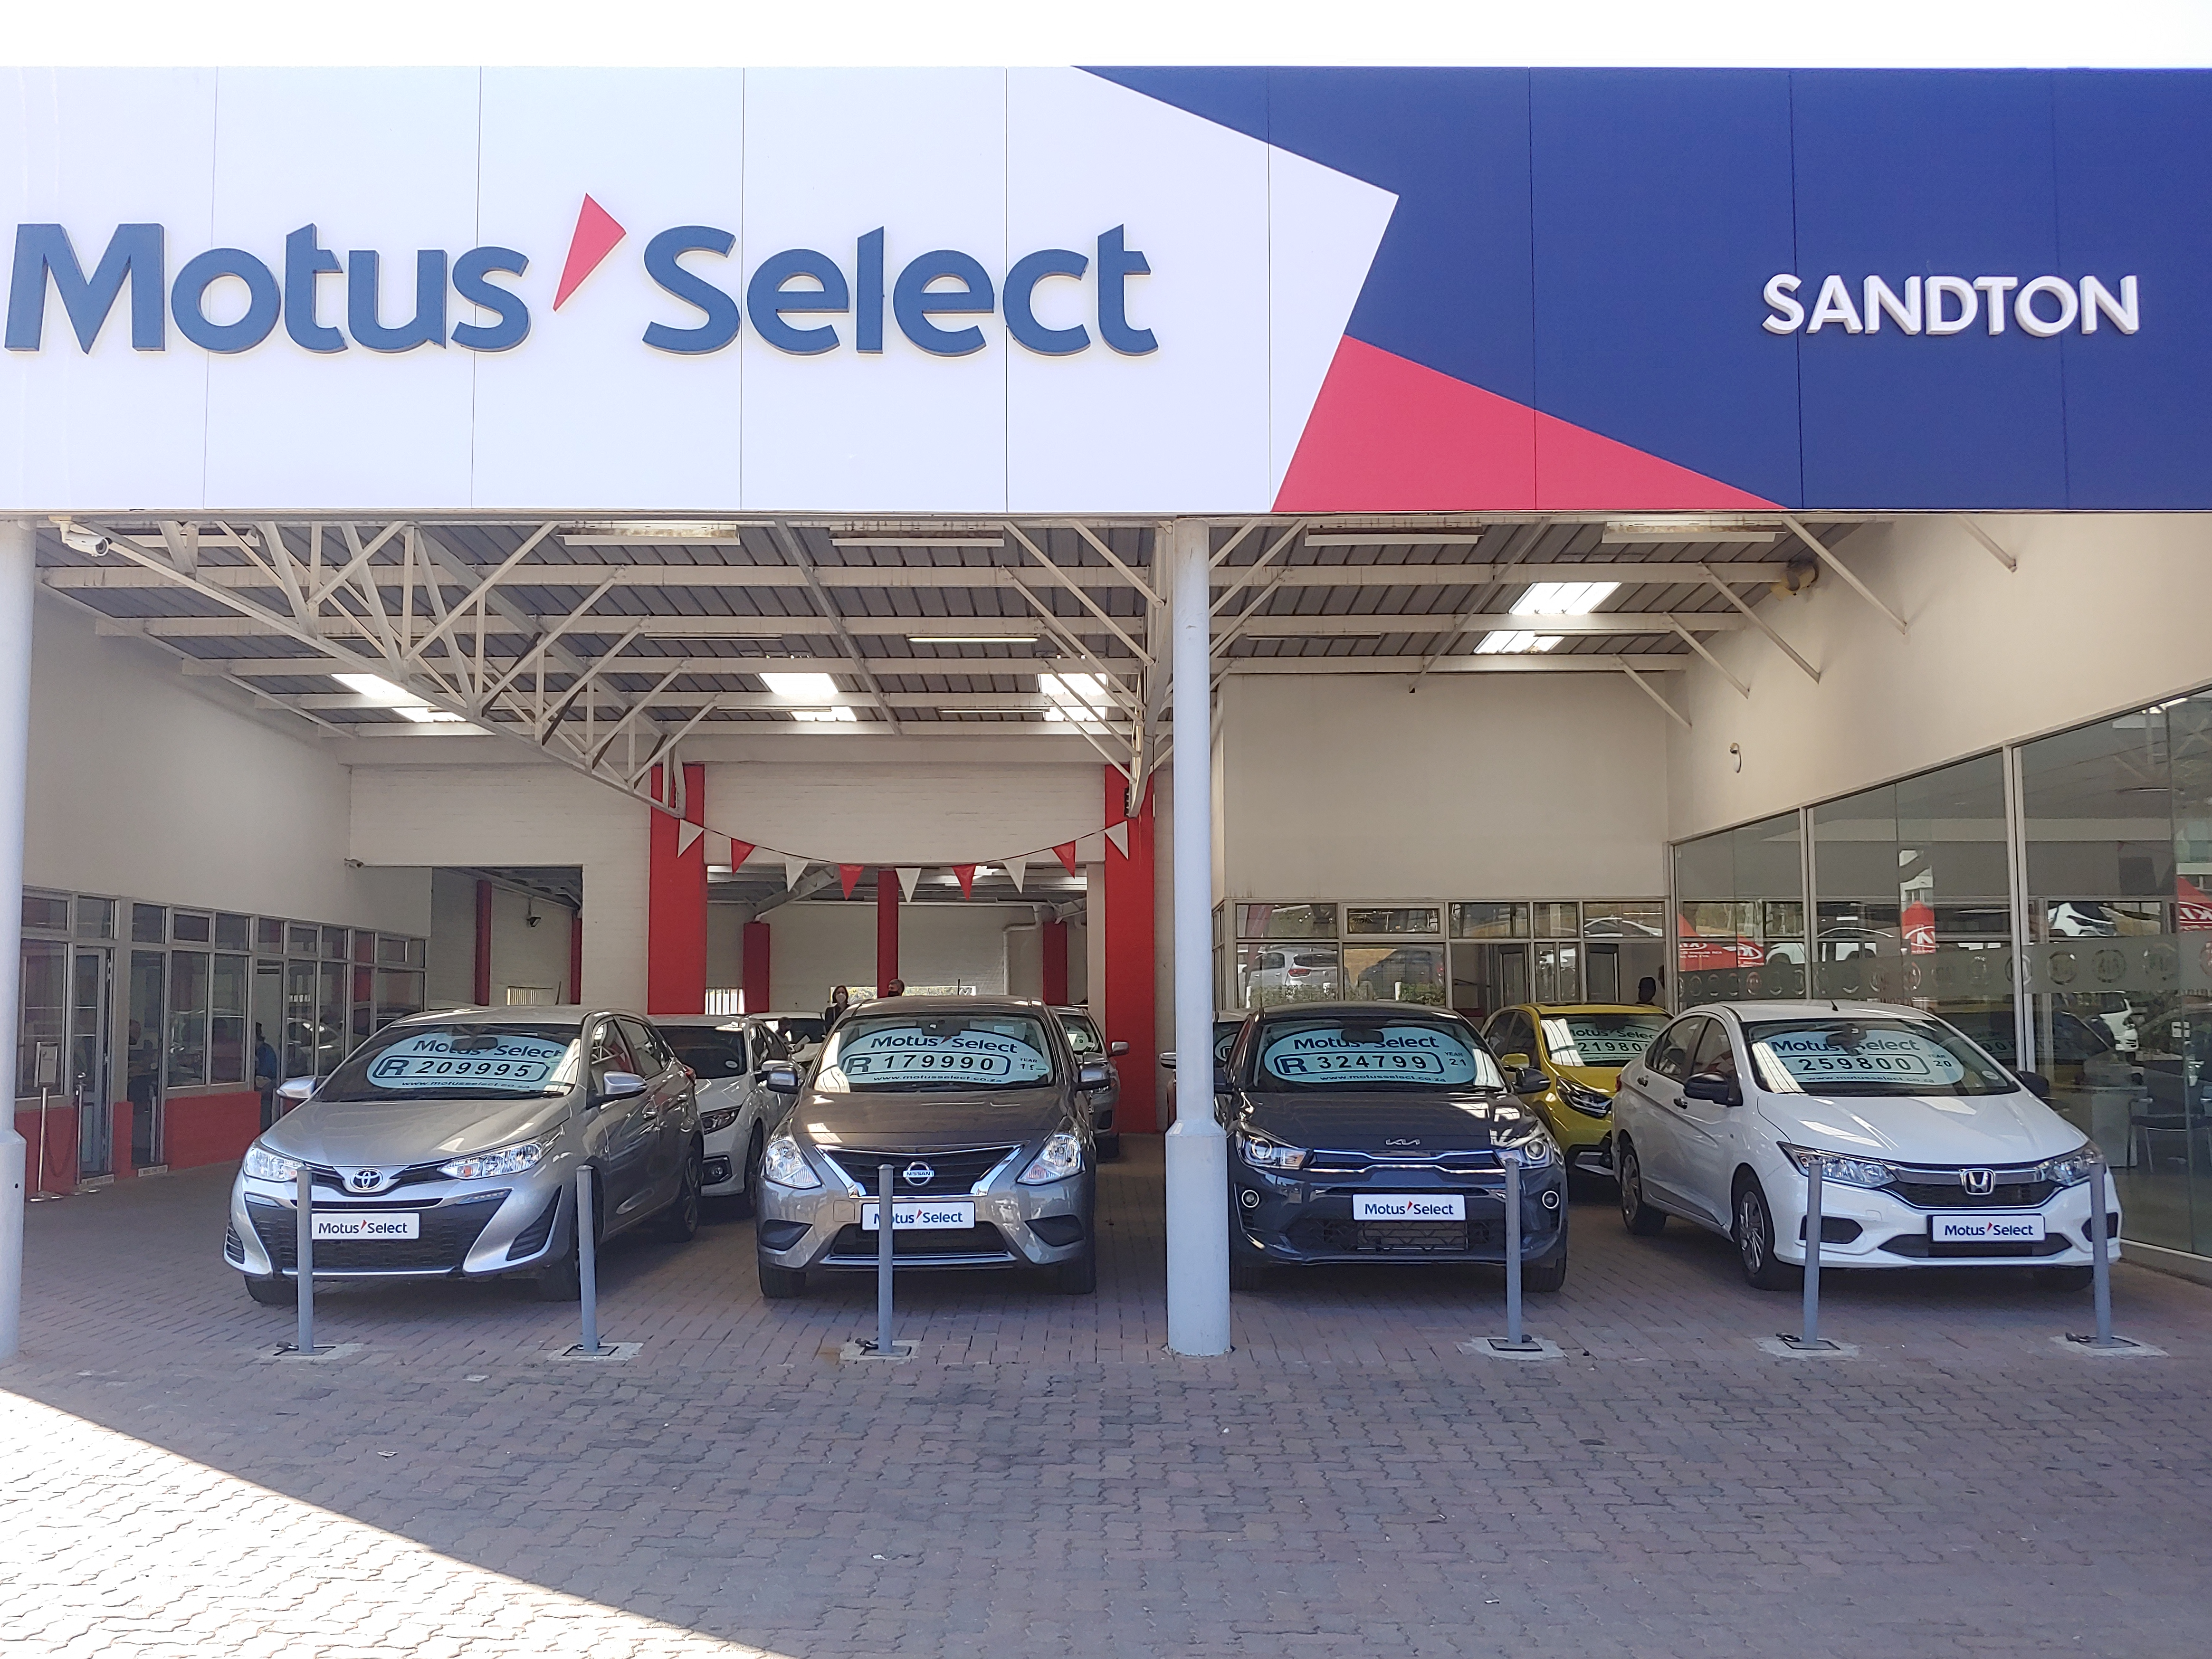 Motus Select Sandton